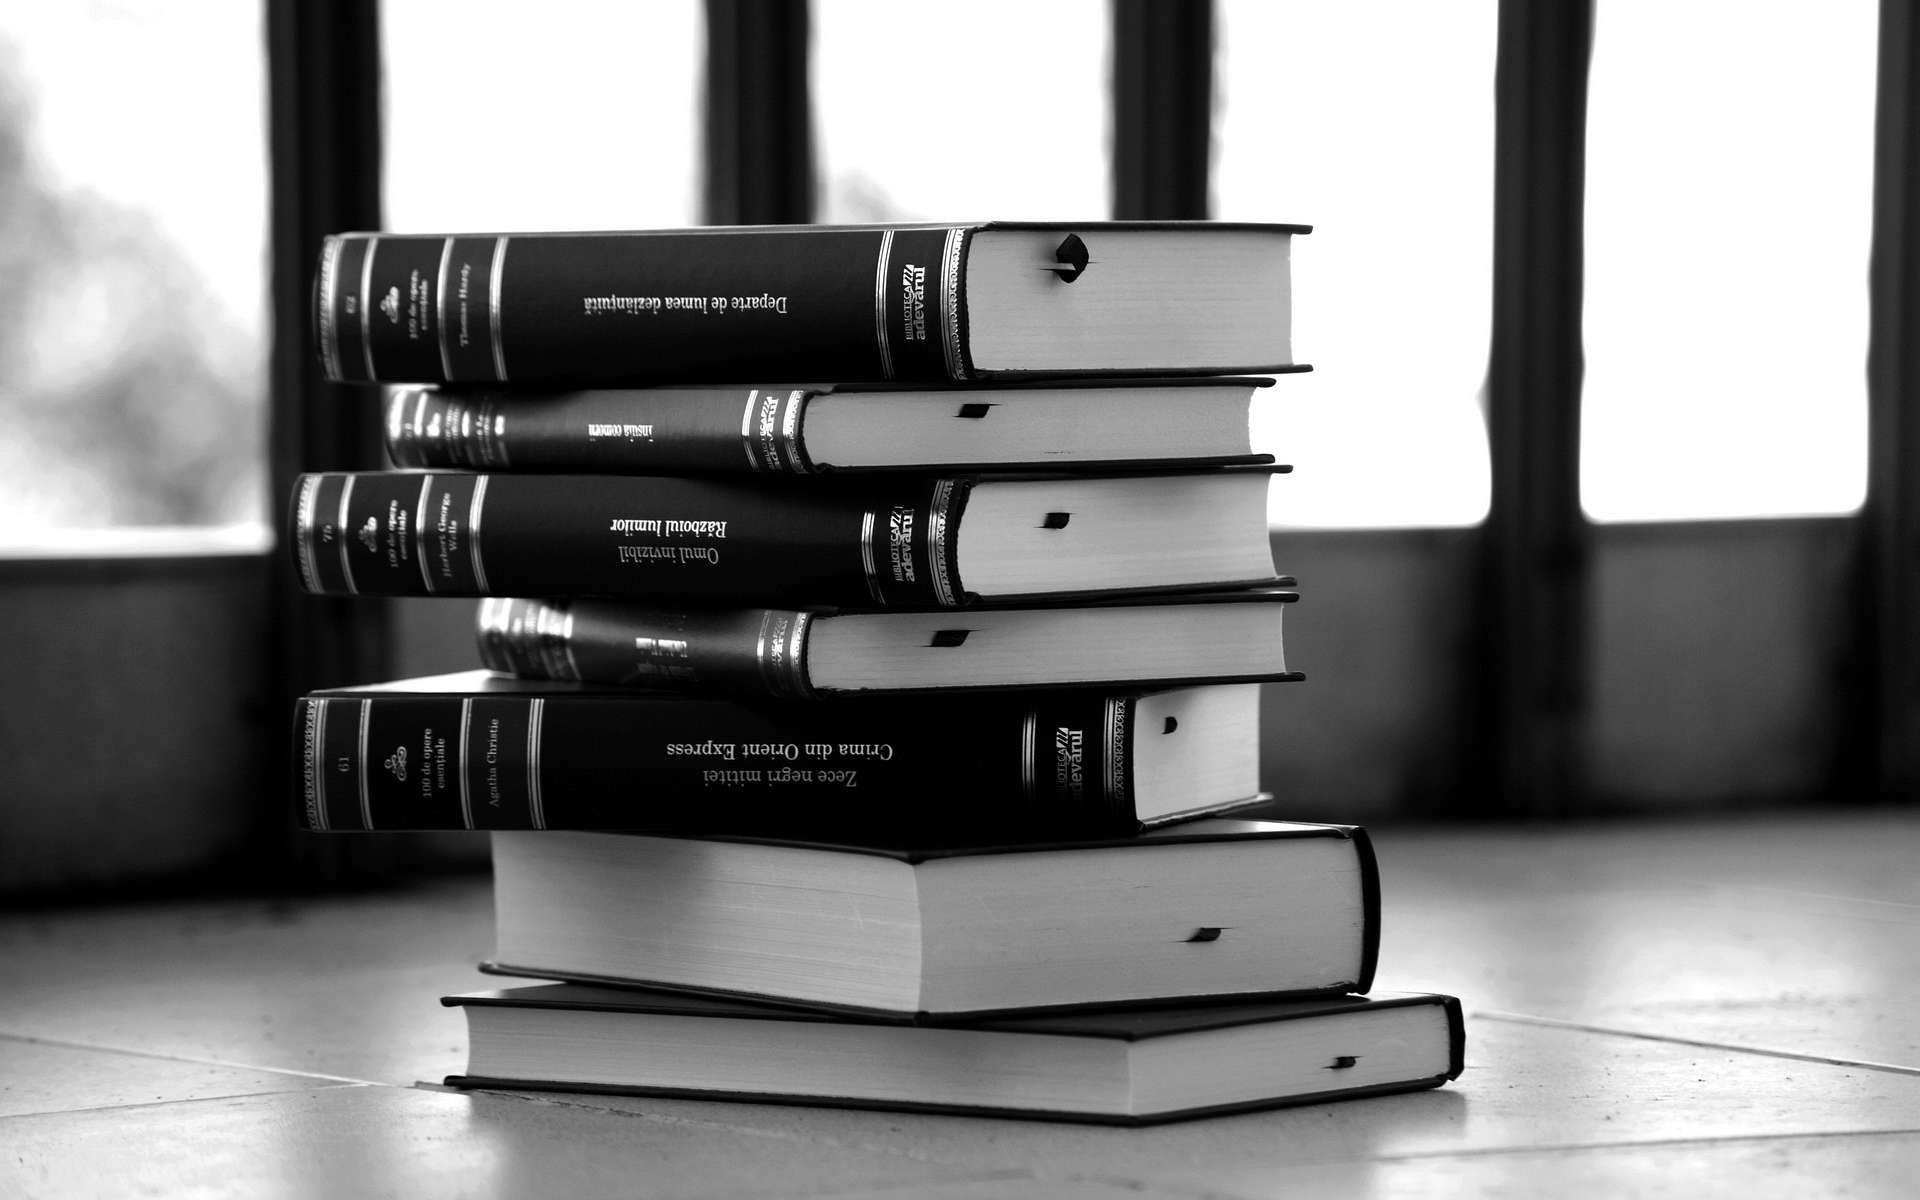 Monochrome Books Desktop Wallpaper 62333